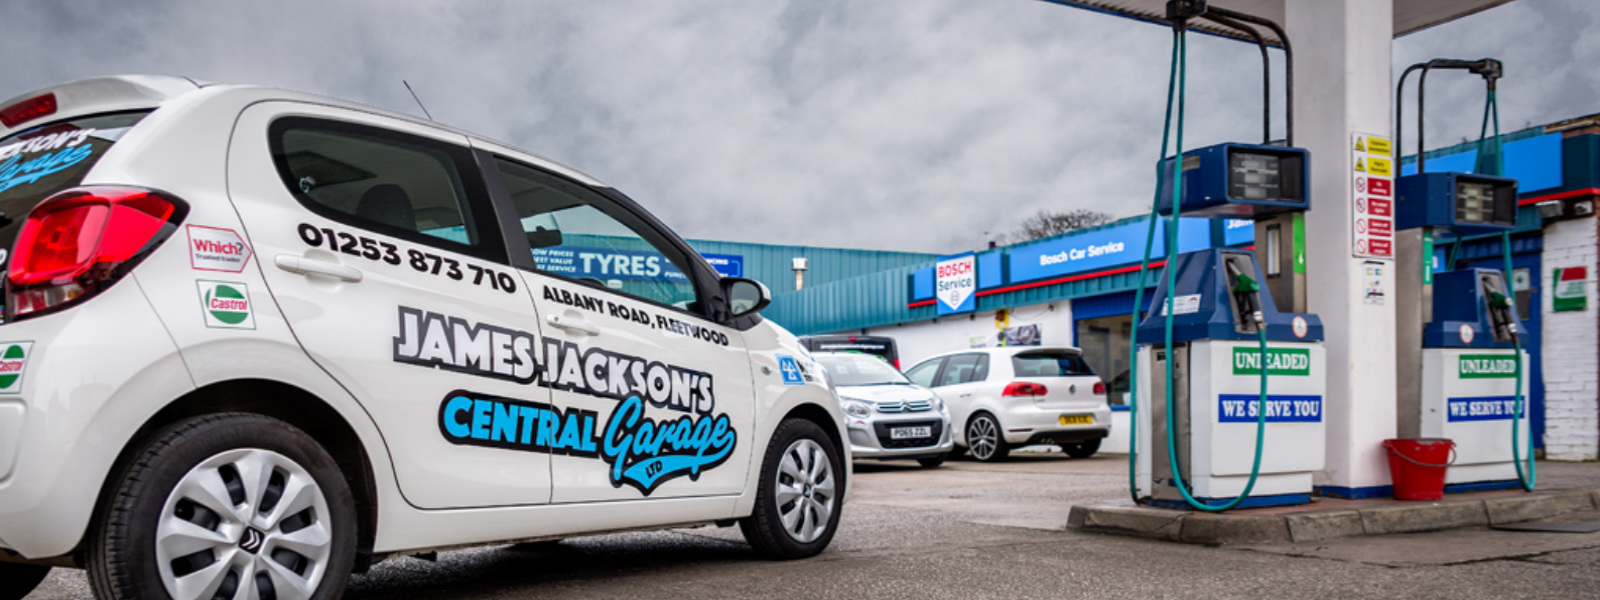 Garage Services in Fleetwood